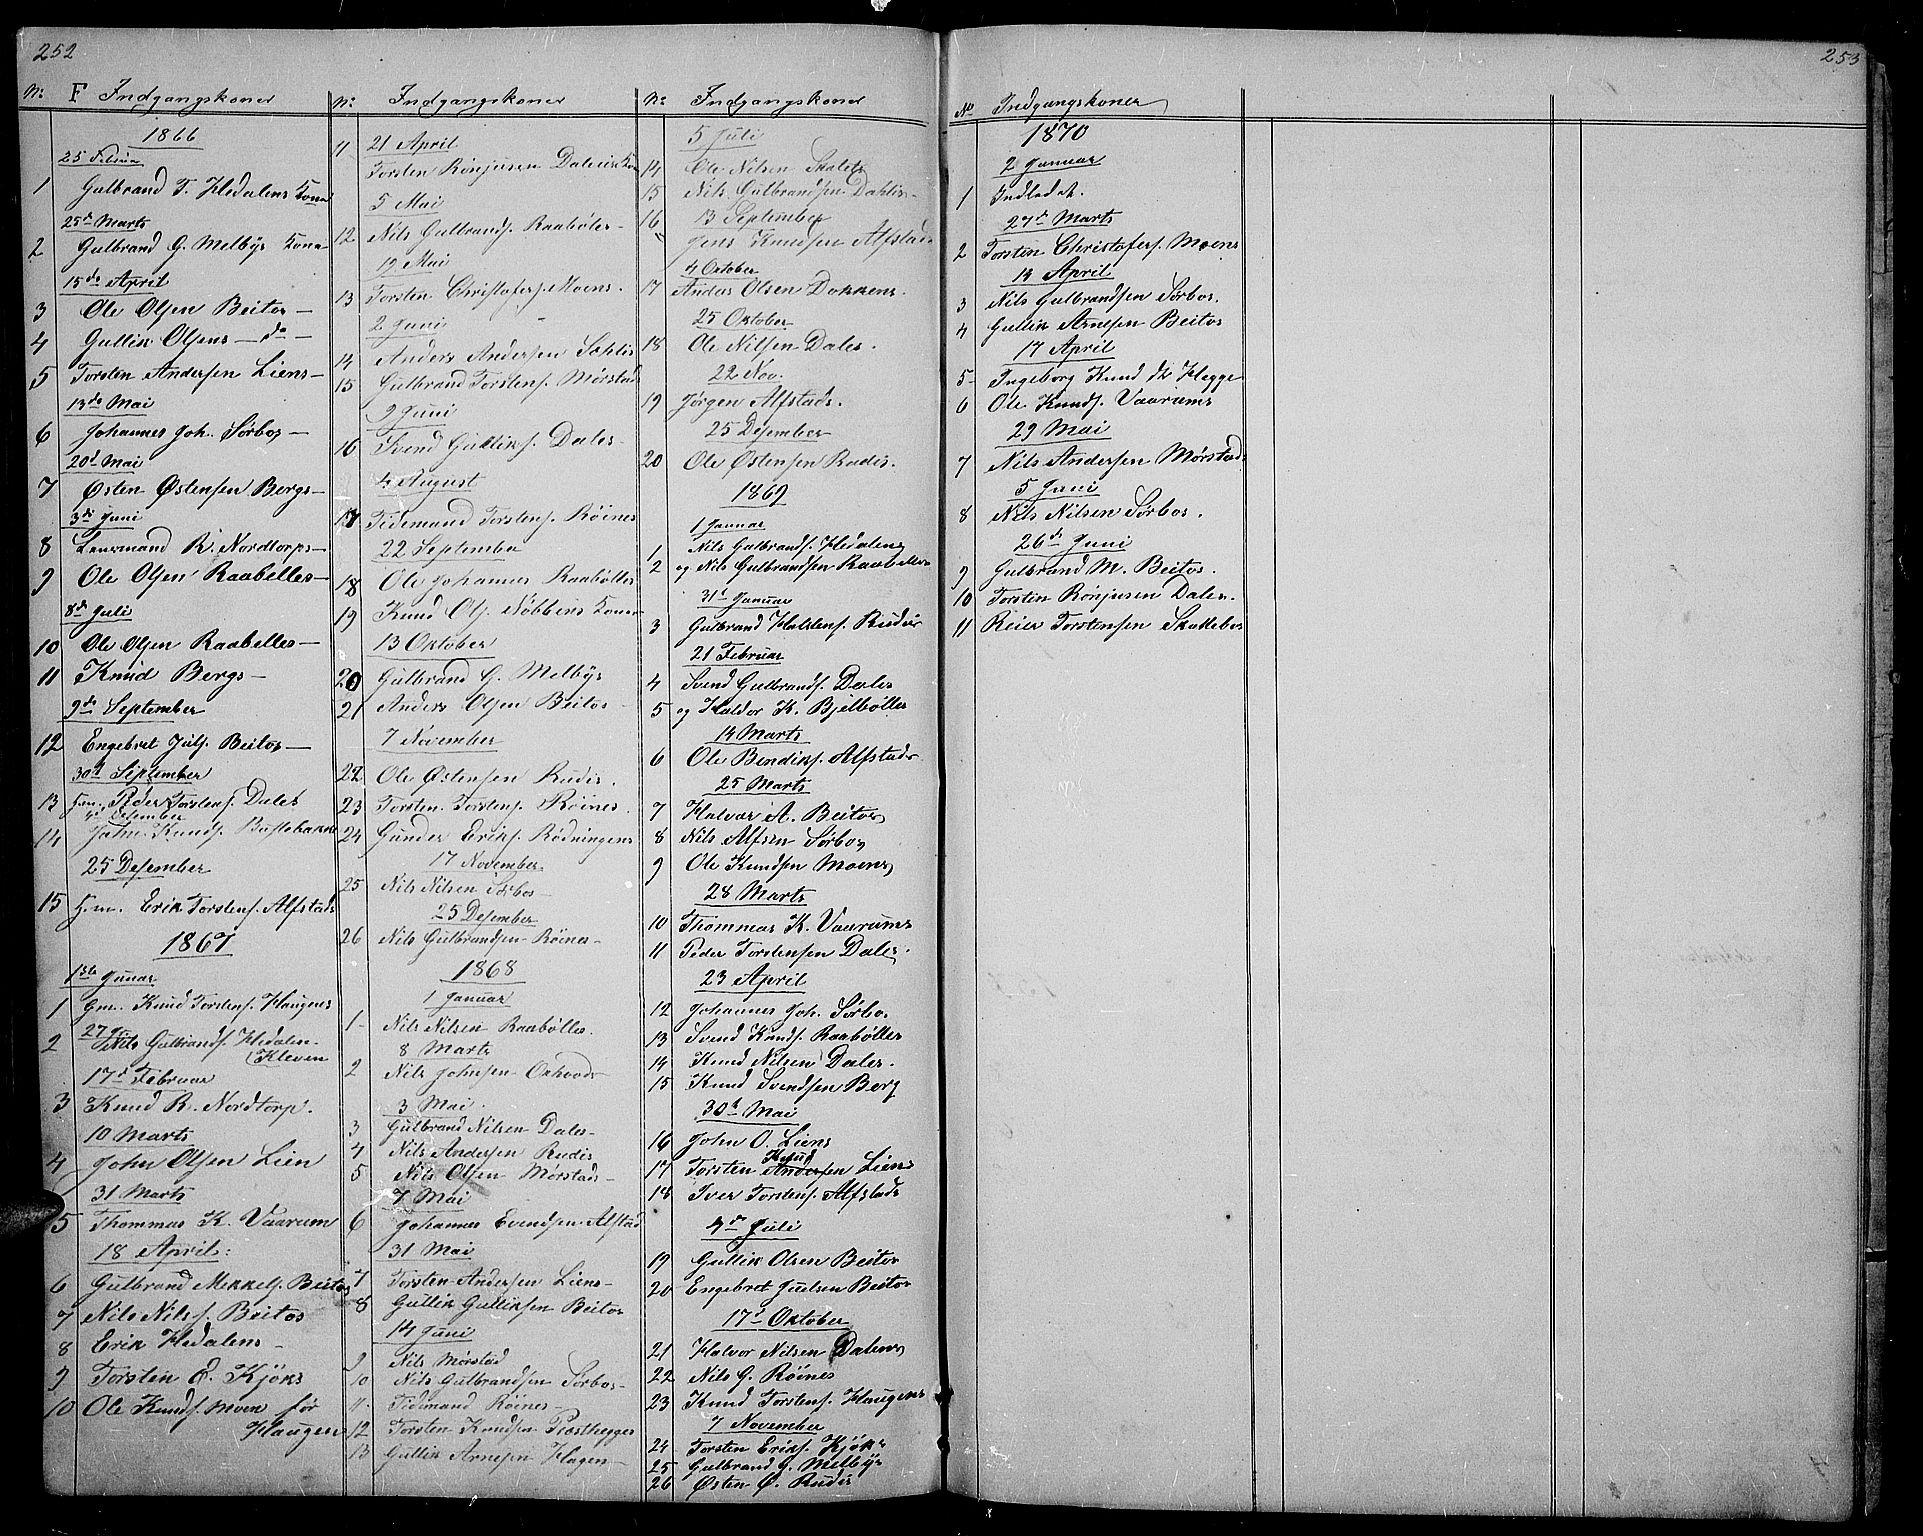 SAH, Øystre Slidre prestekontor, Klokkerbok nr. 1, 1866-1886, s. 252-253